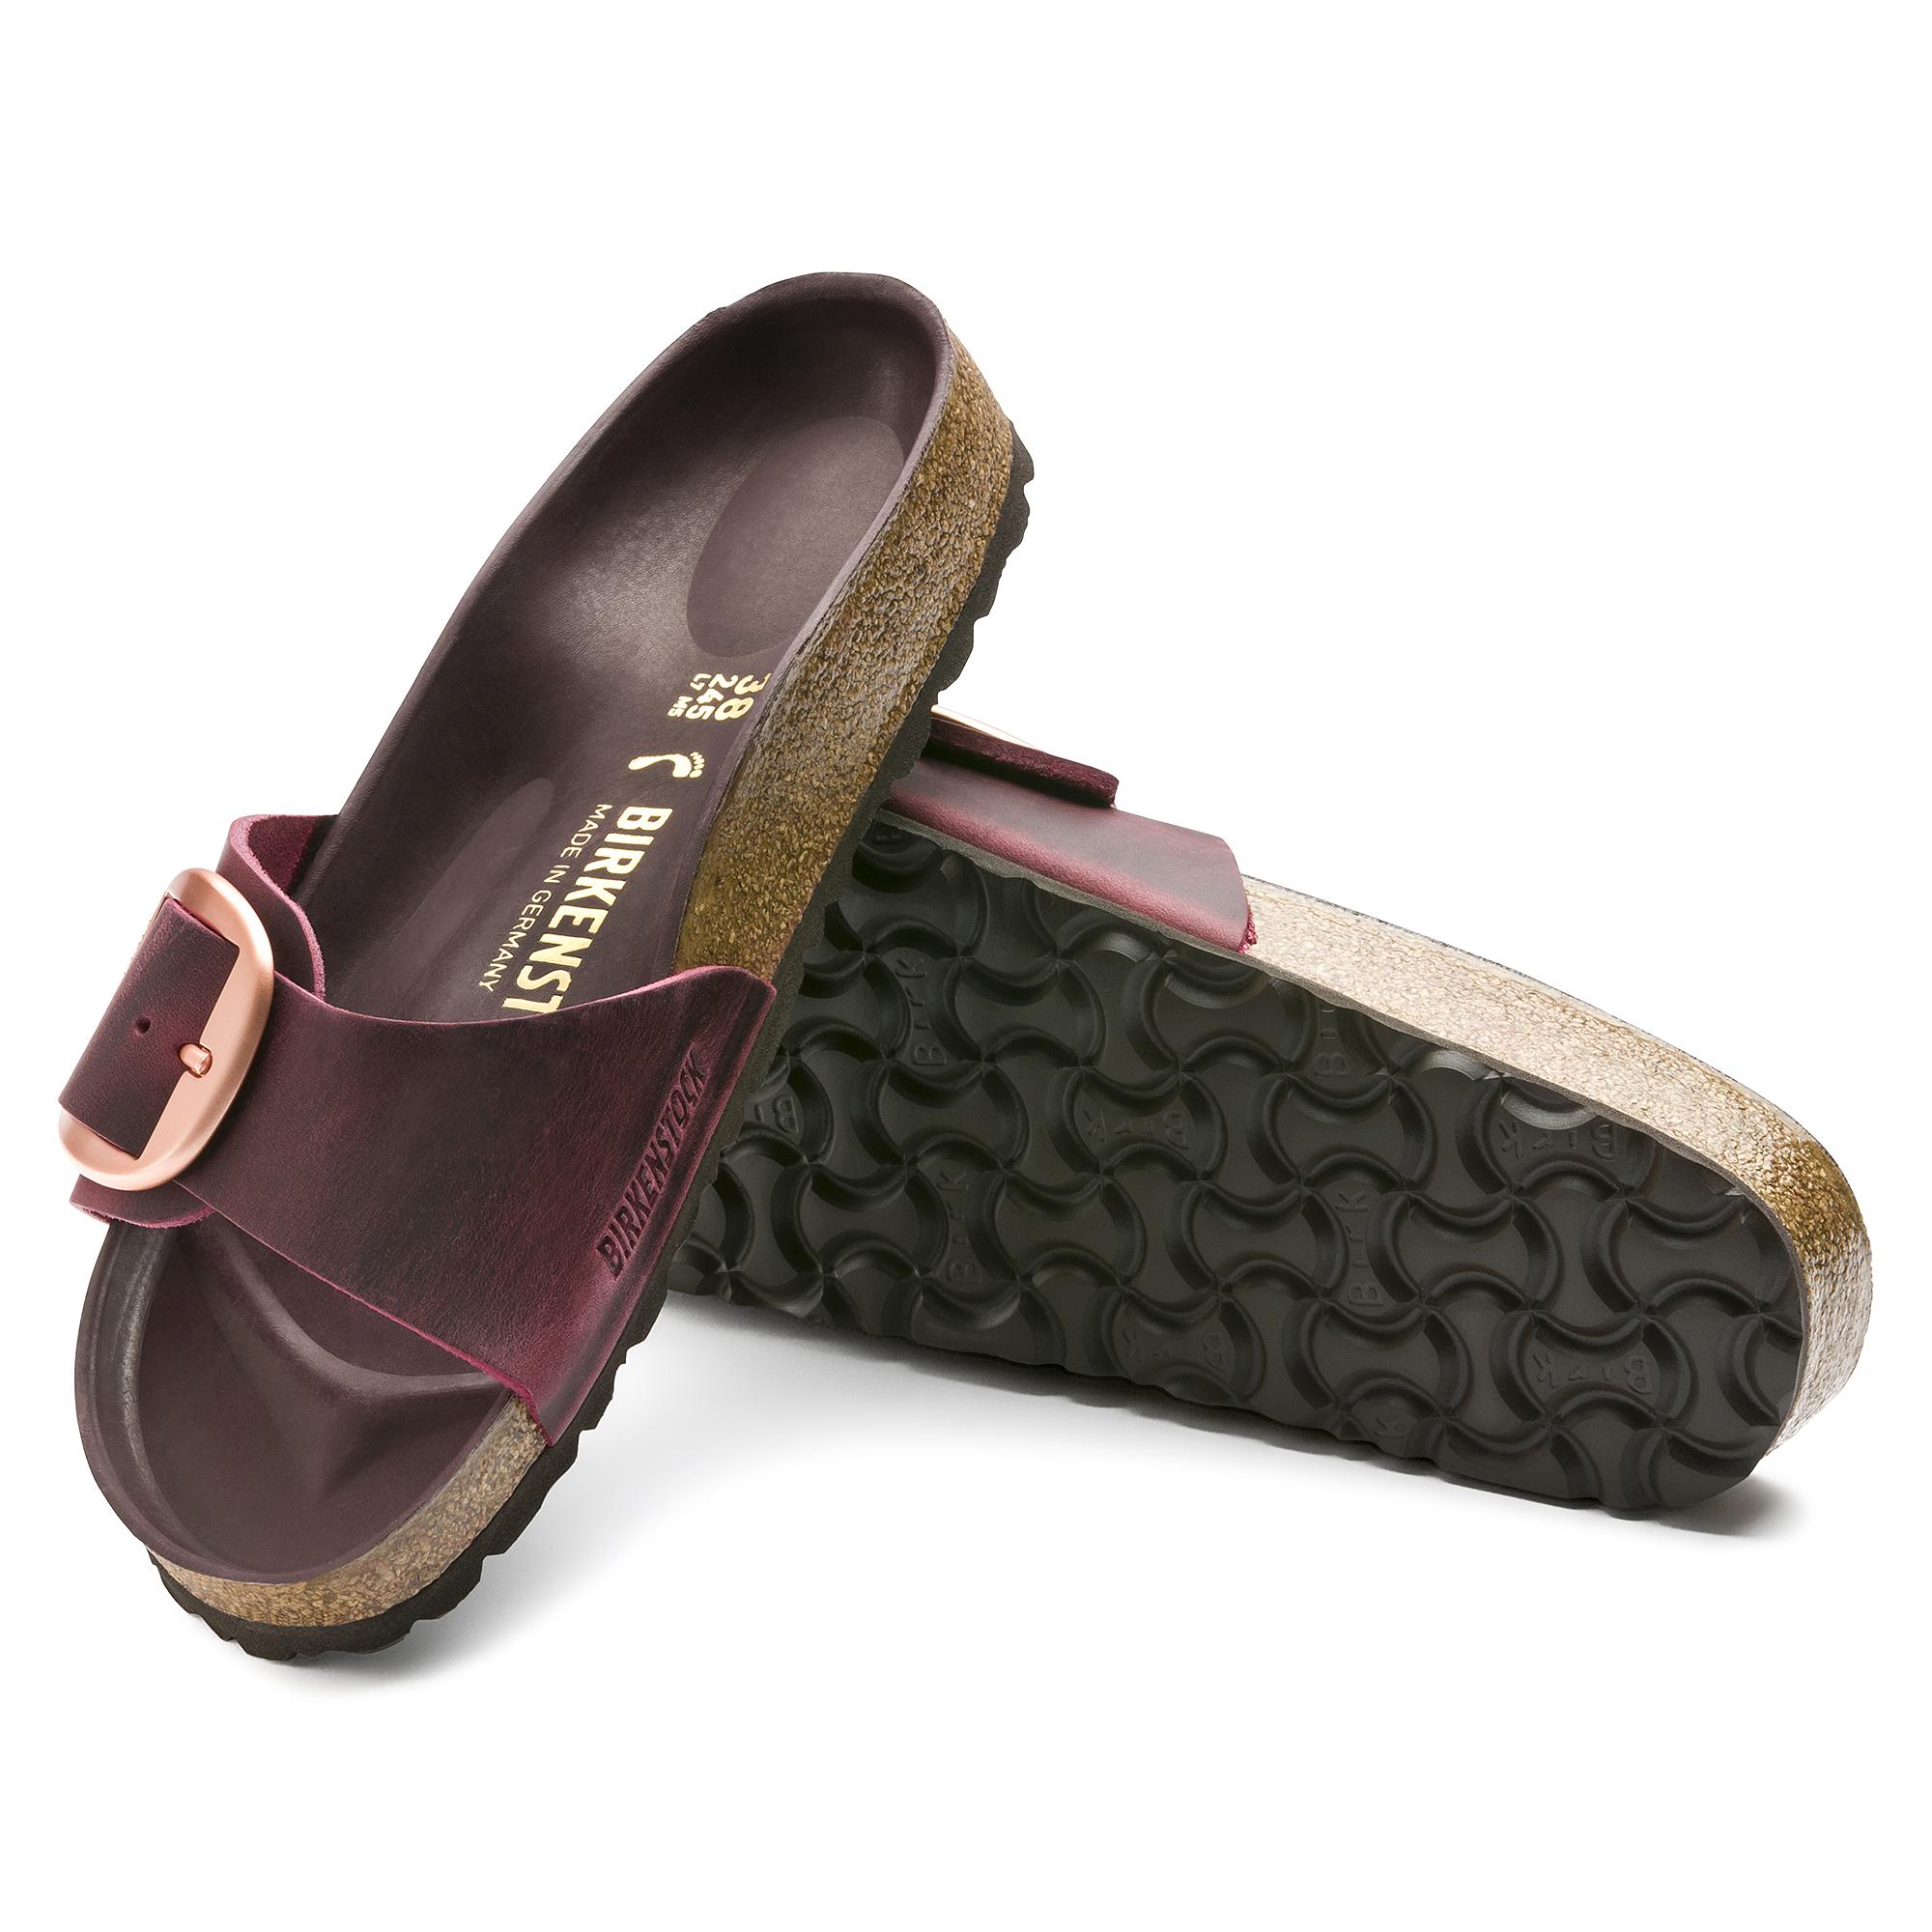 Birkenstocks Inspiration Premium Collection Women Madrid Oiled Leather Zinfandel